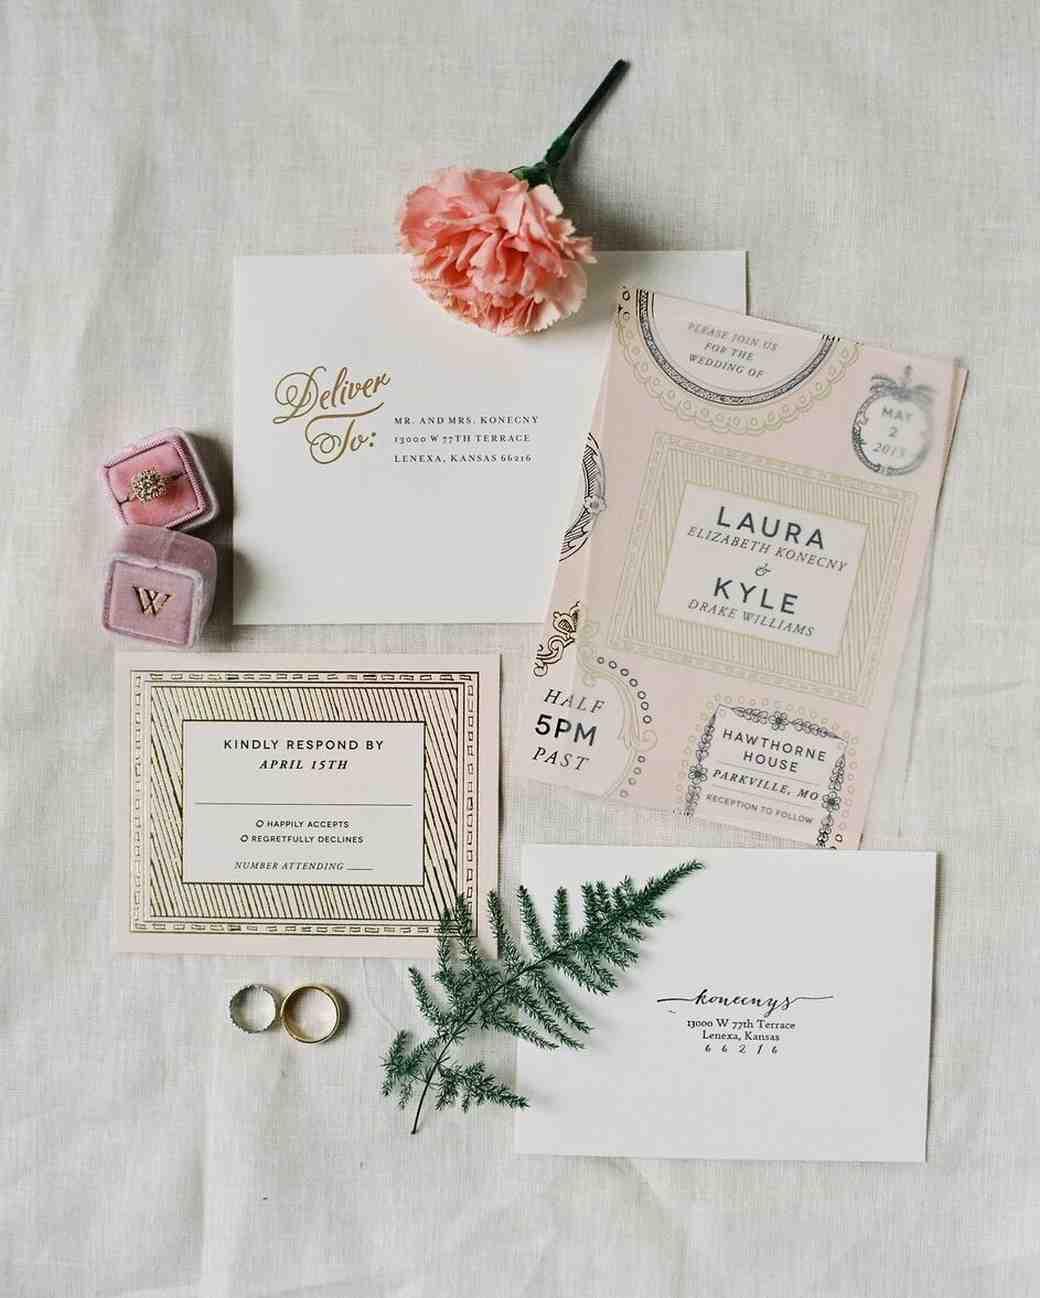 funky wedding invitations - Yeni.mescale.co